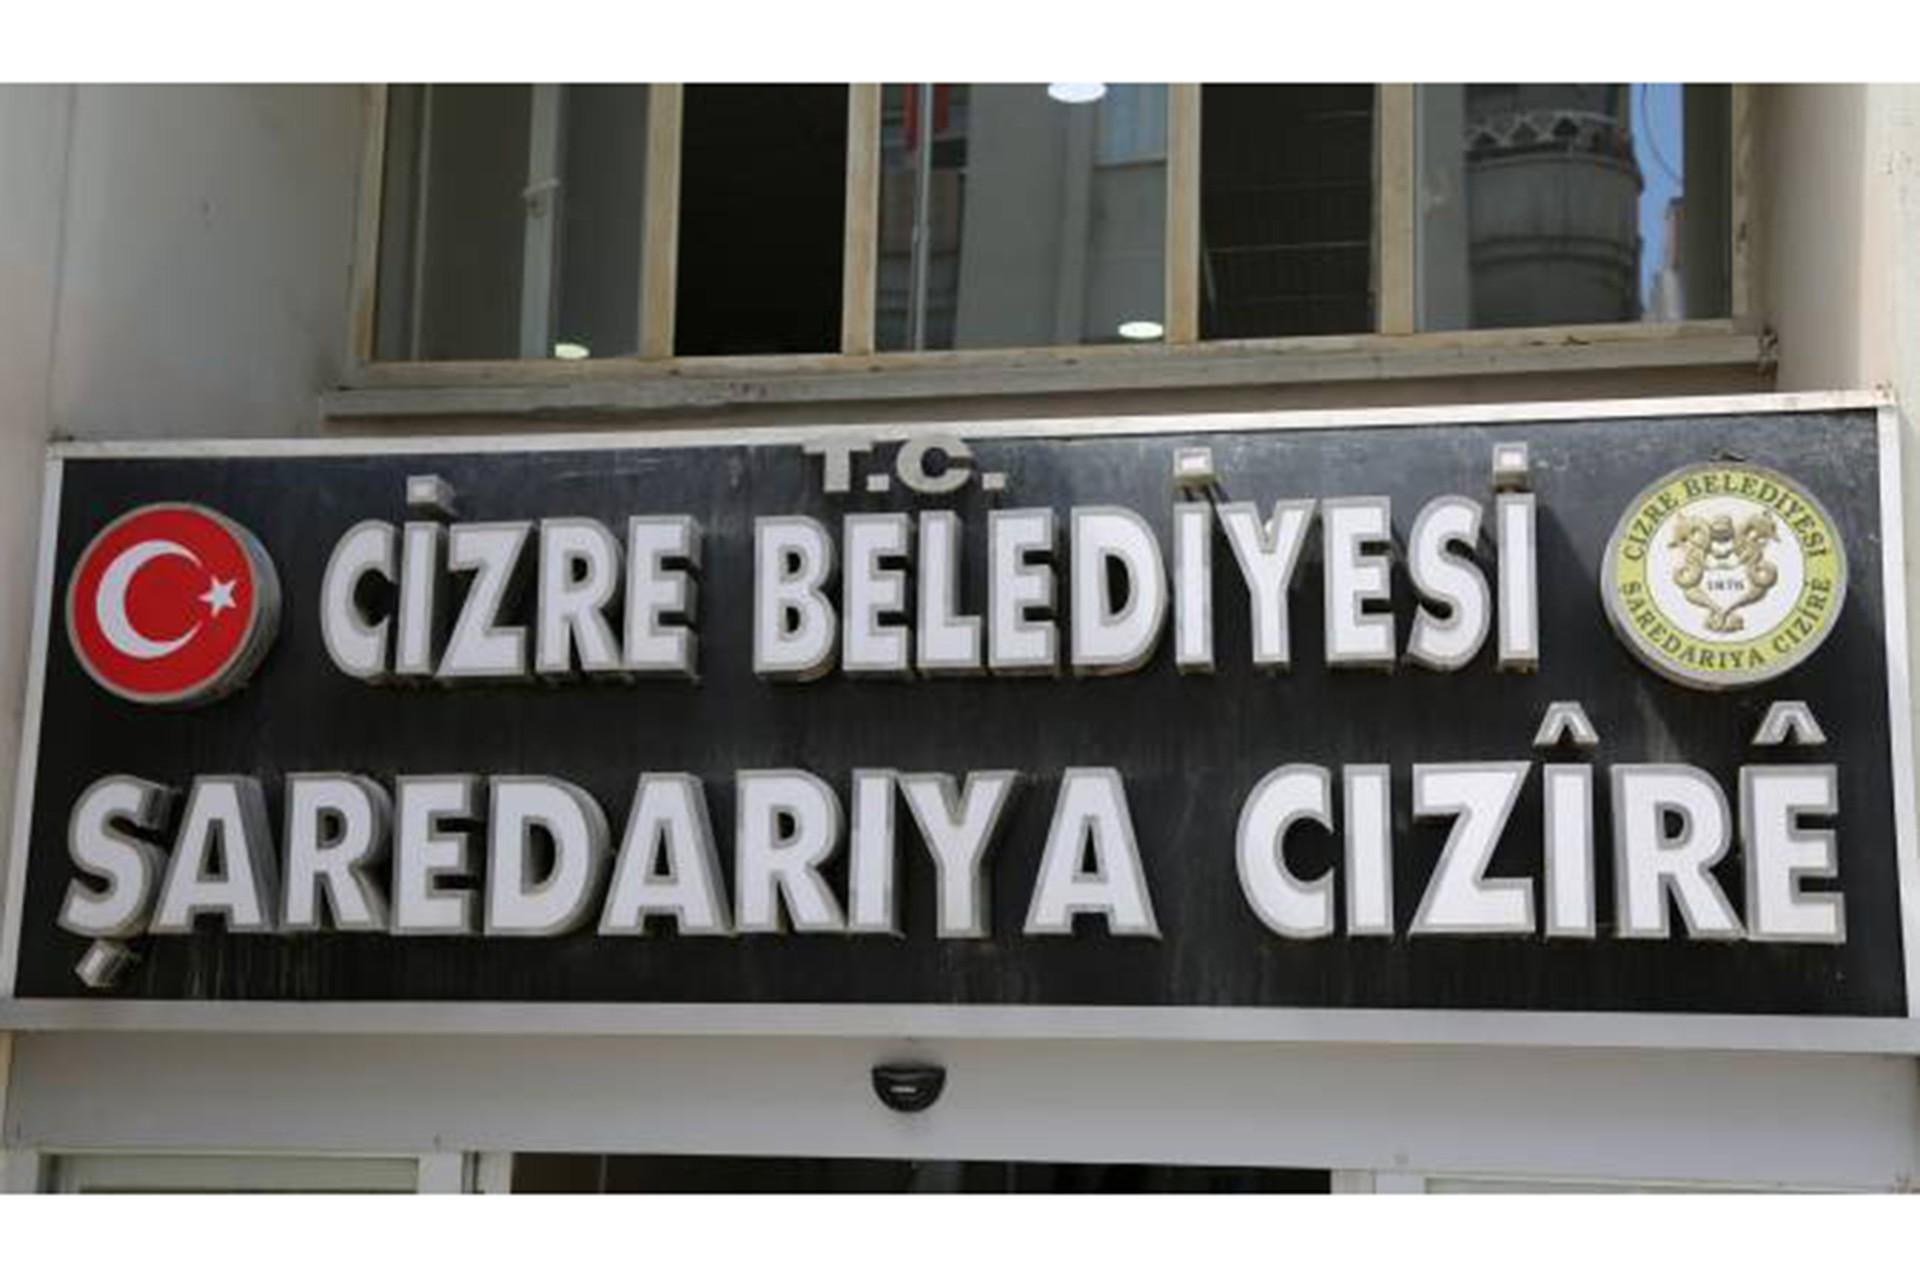 Cizre kayyumundan belediyeye 'ödenmemiş maaş' haczi